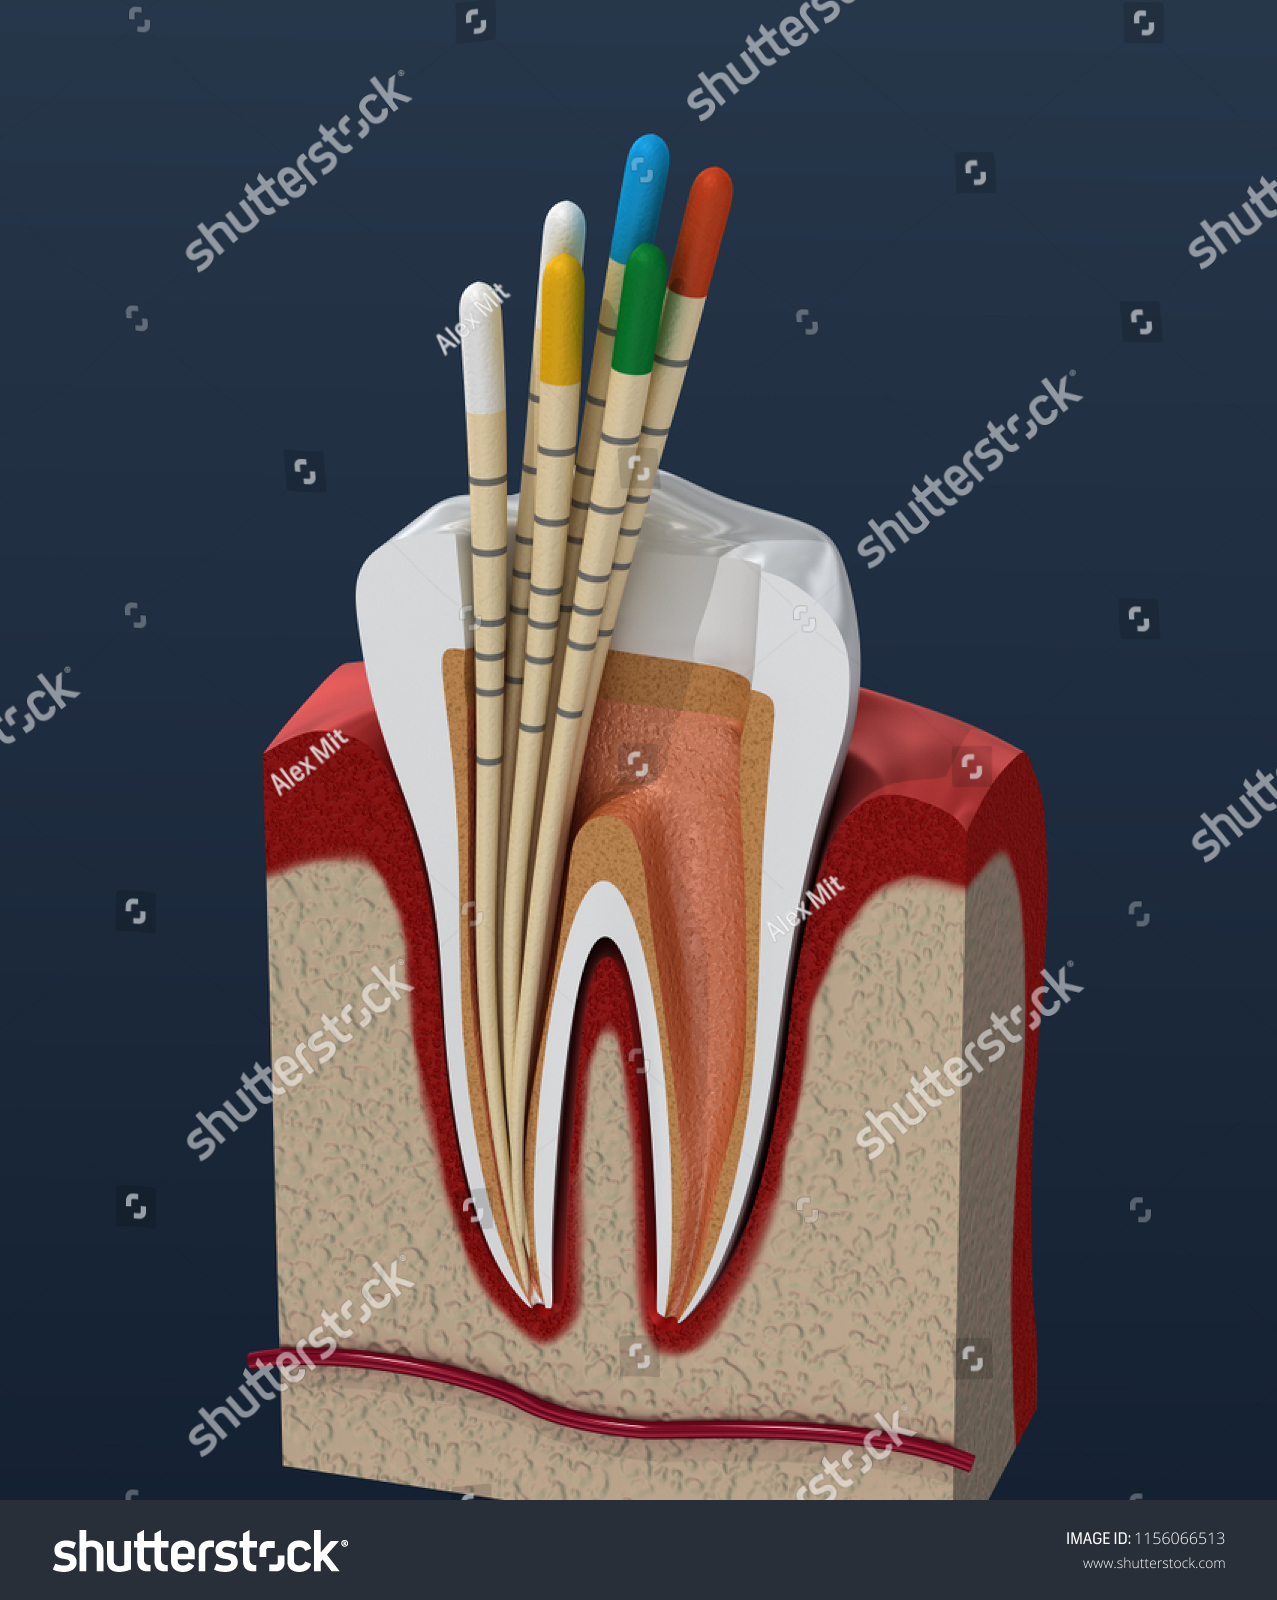 Gutta Percha Endodontics Instrument Dental Anatomy Stock ...